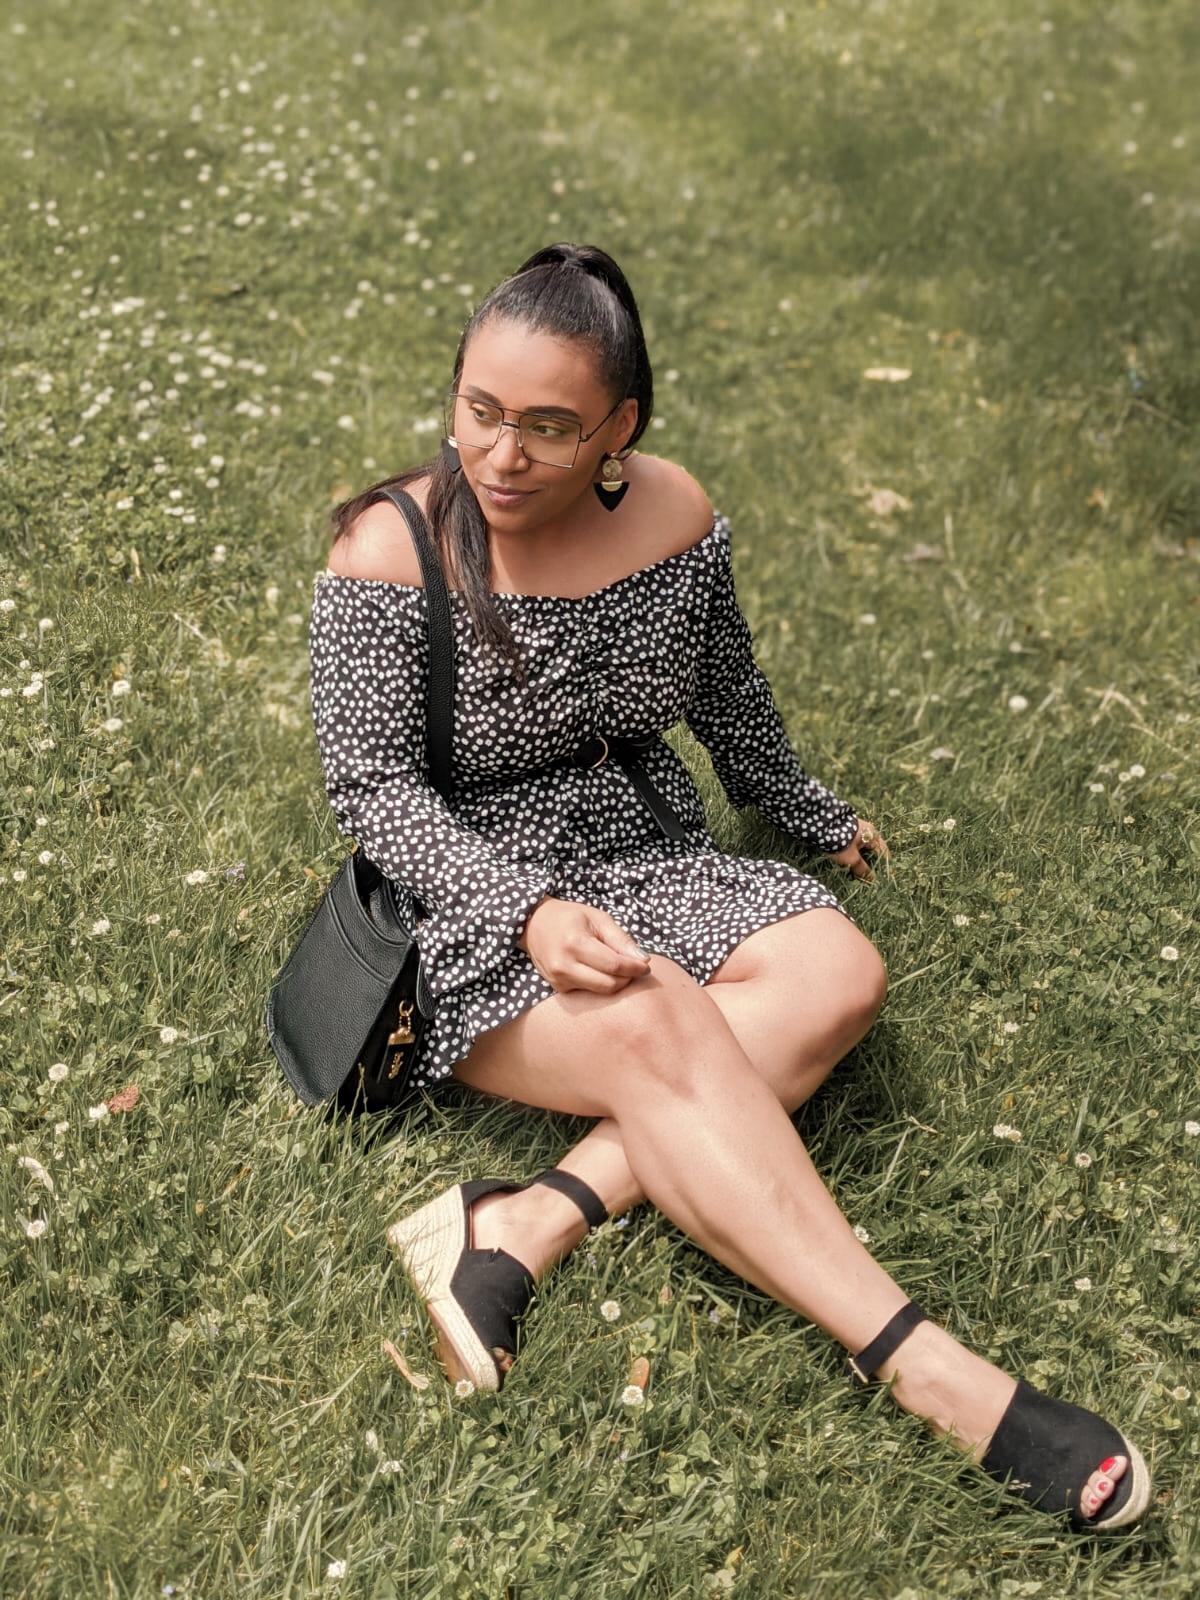 shein, shein reviews, shein dress, summer outfit ideas, pattys kloset, floral summer dresses, off the shoulder dress